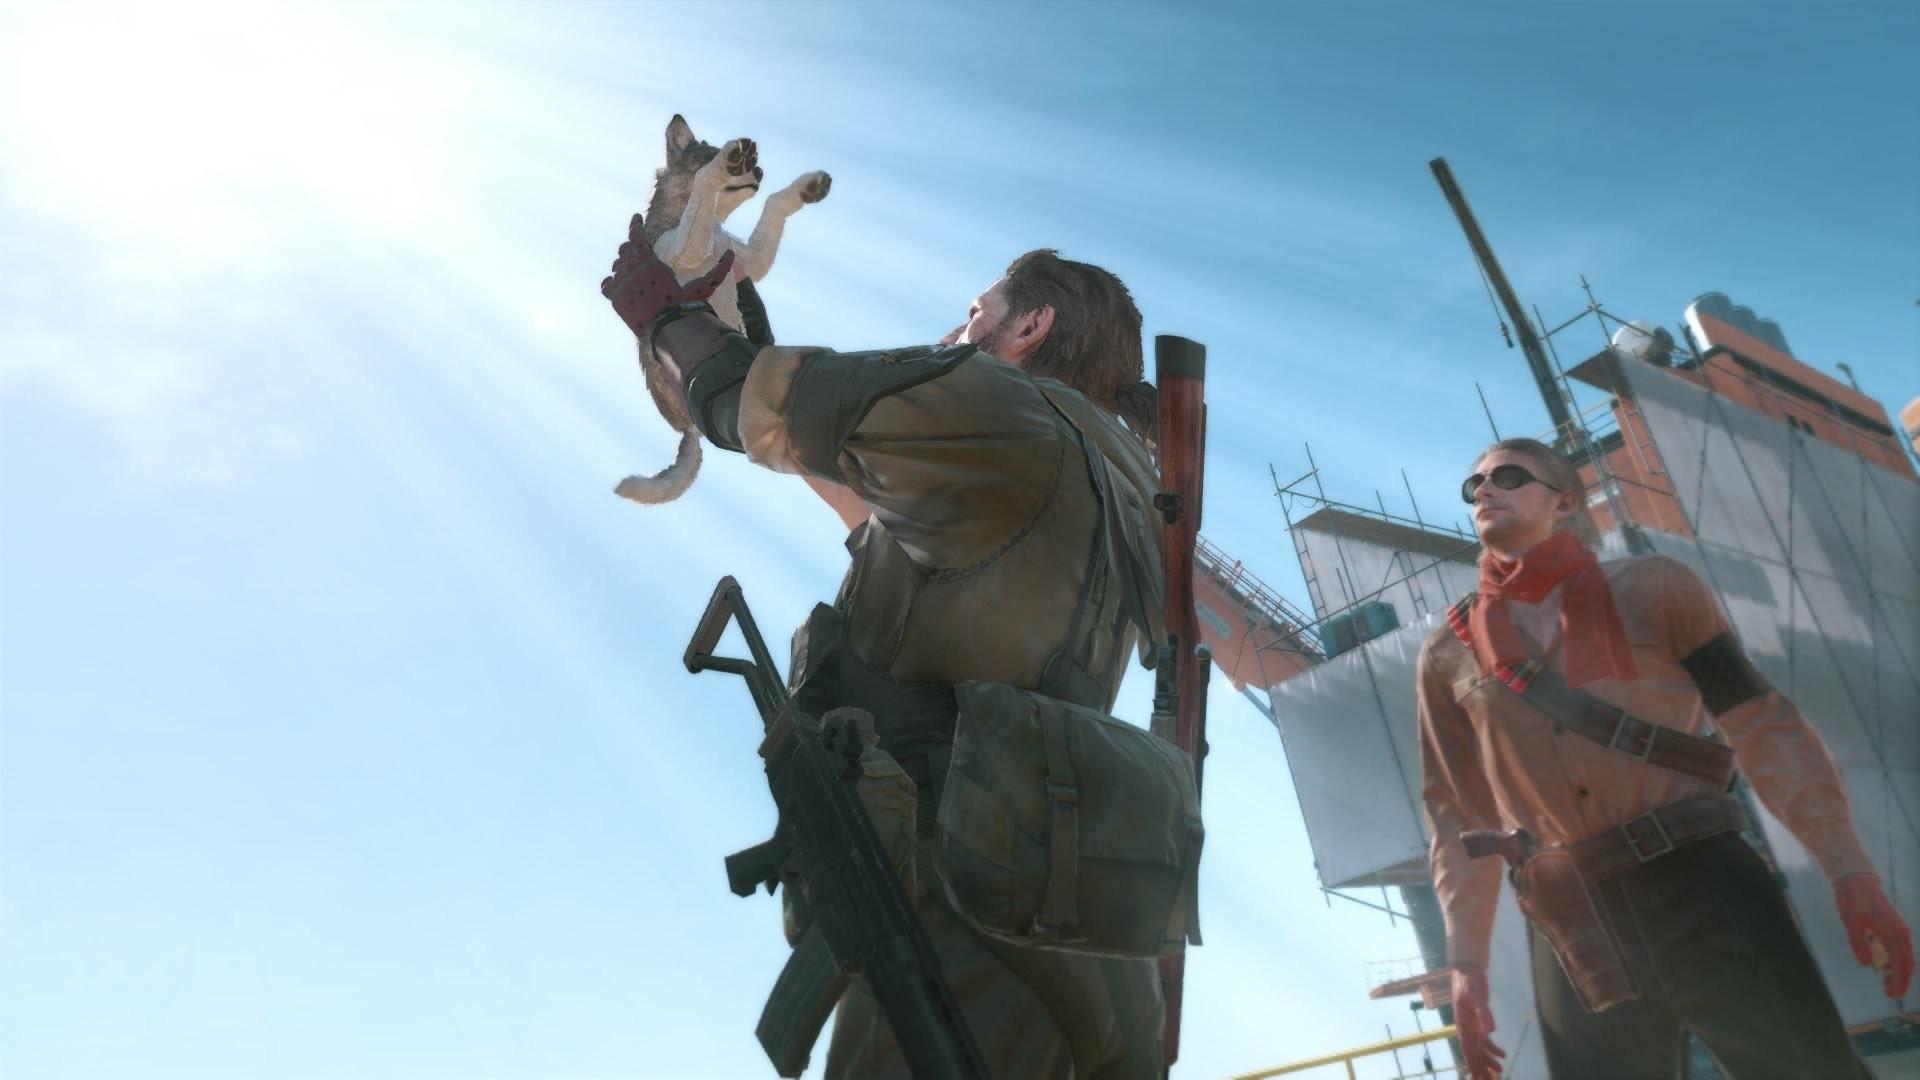 Metal Gear Solid 5 The Phantom Pain – D-Dog Puppy Cutscene (MGS5)